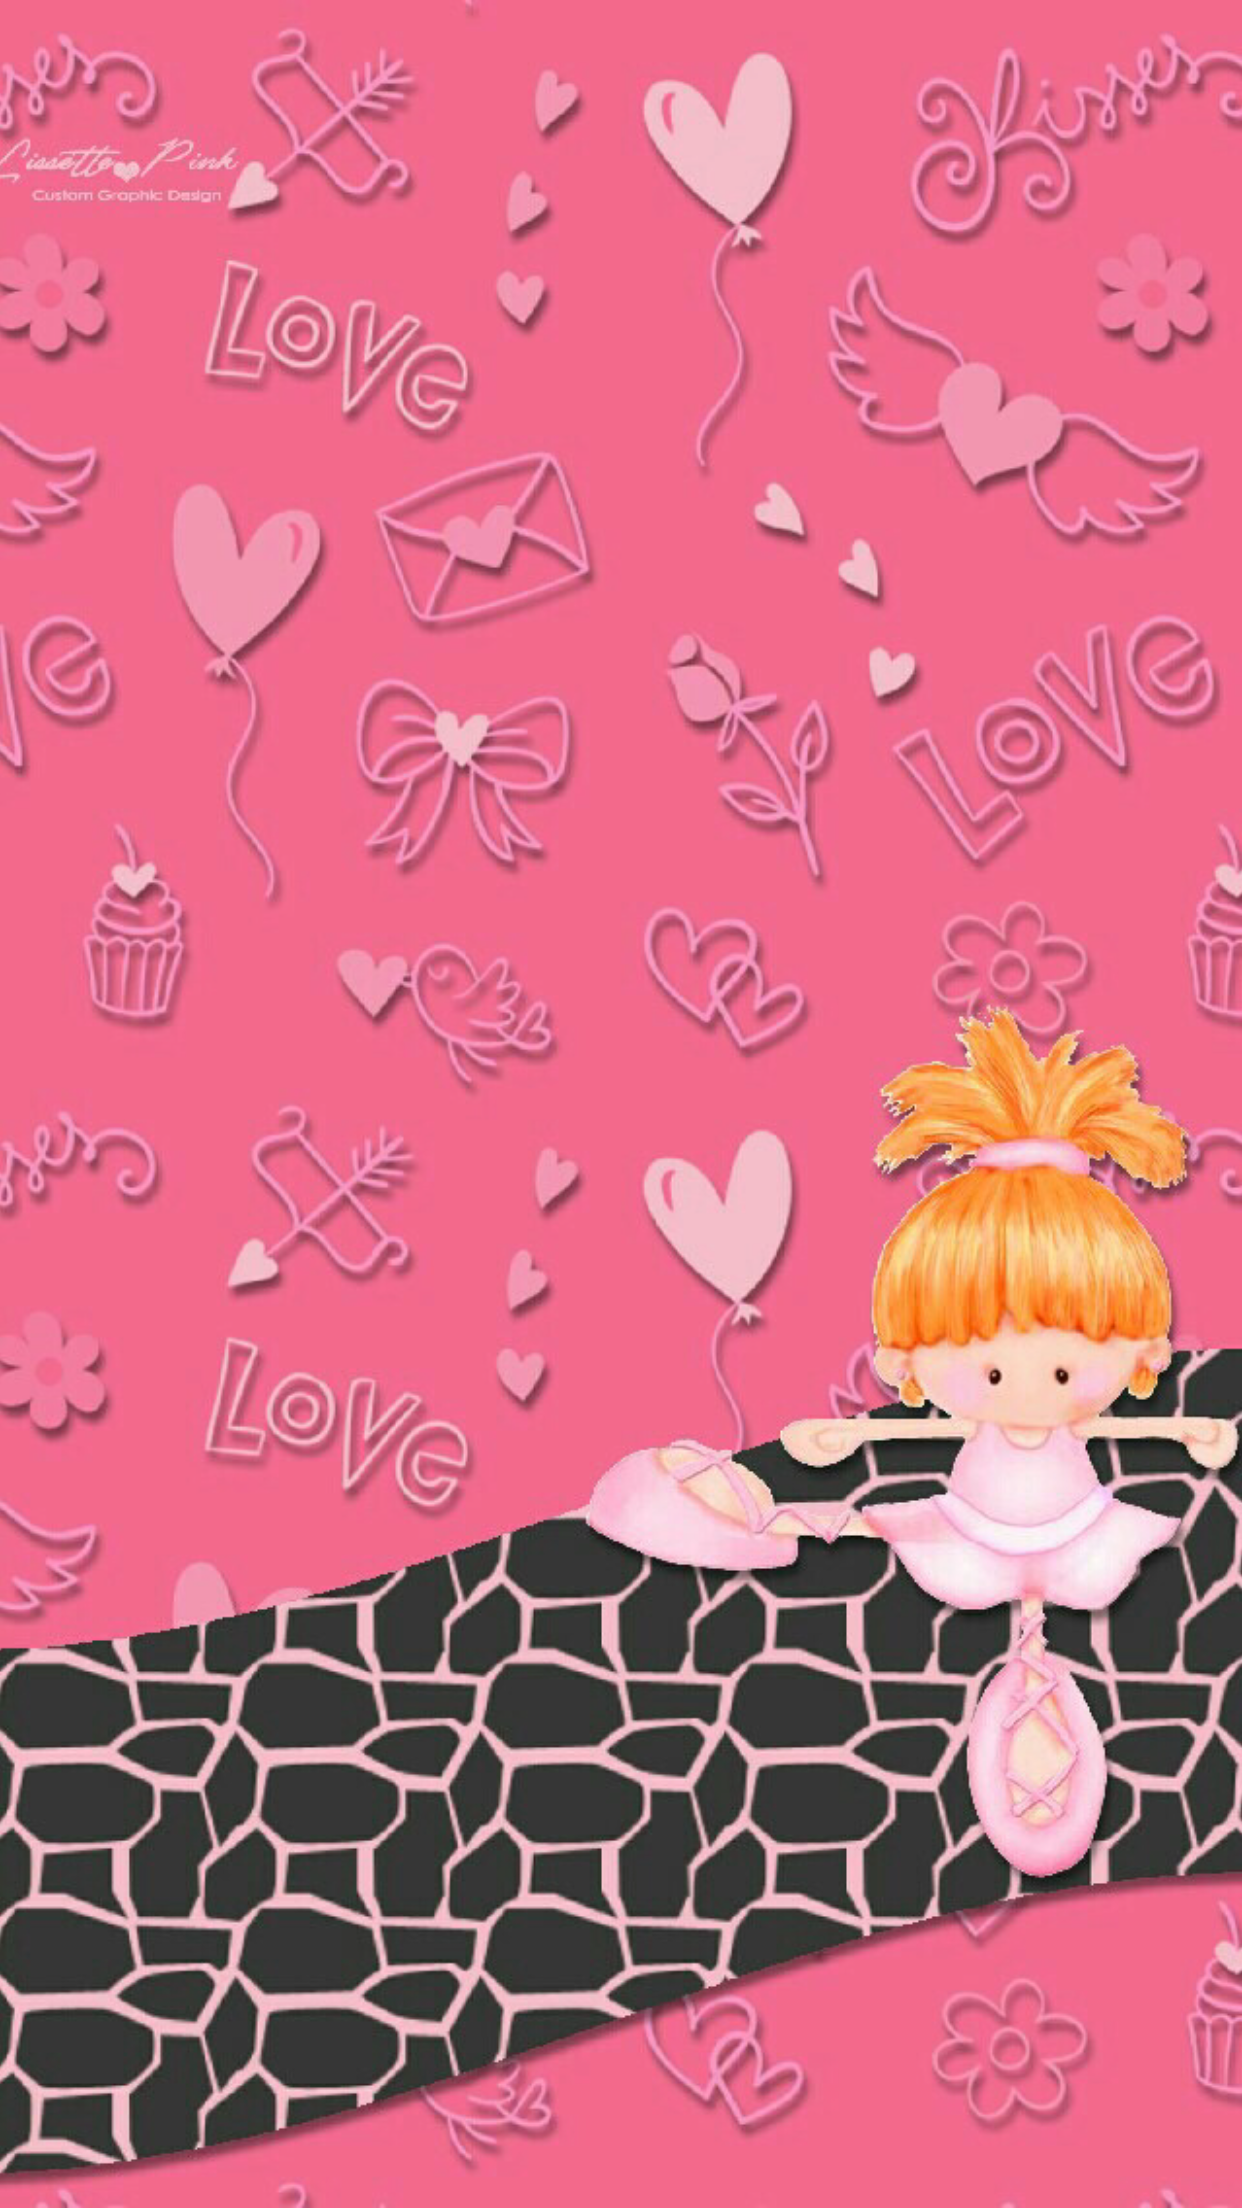 Cute Love Wallpaper Iphone Wallpapers 2 Pinterest Love